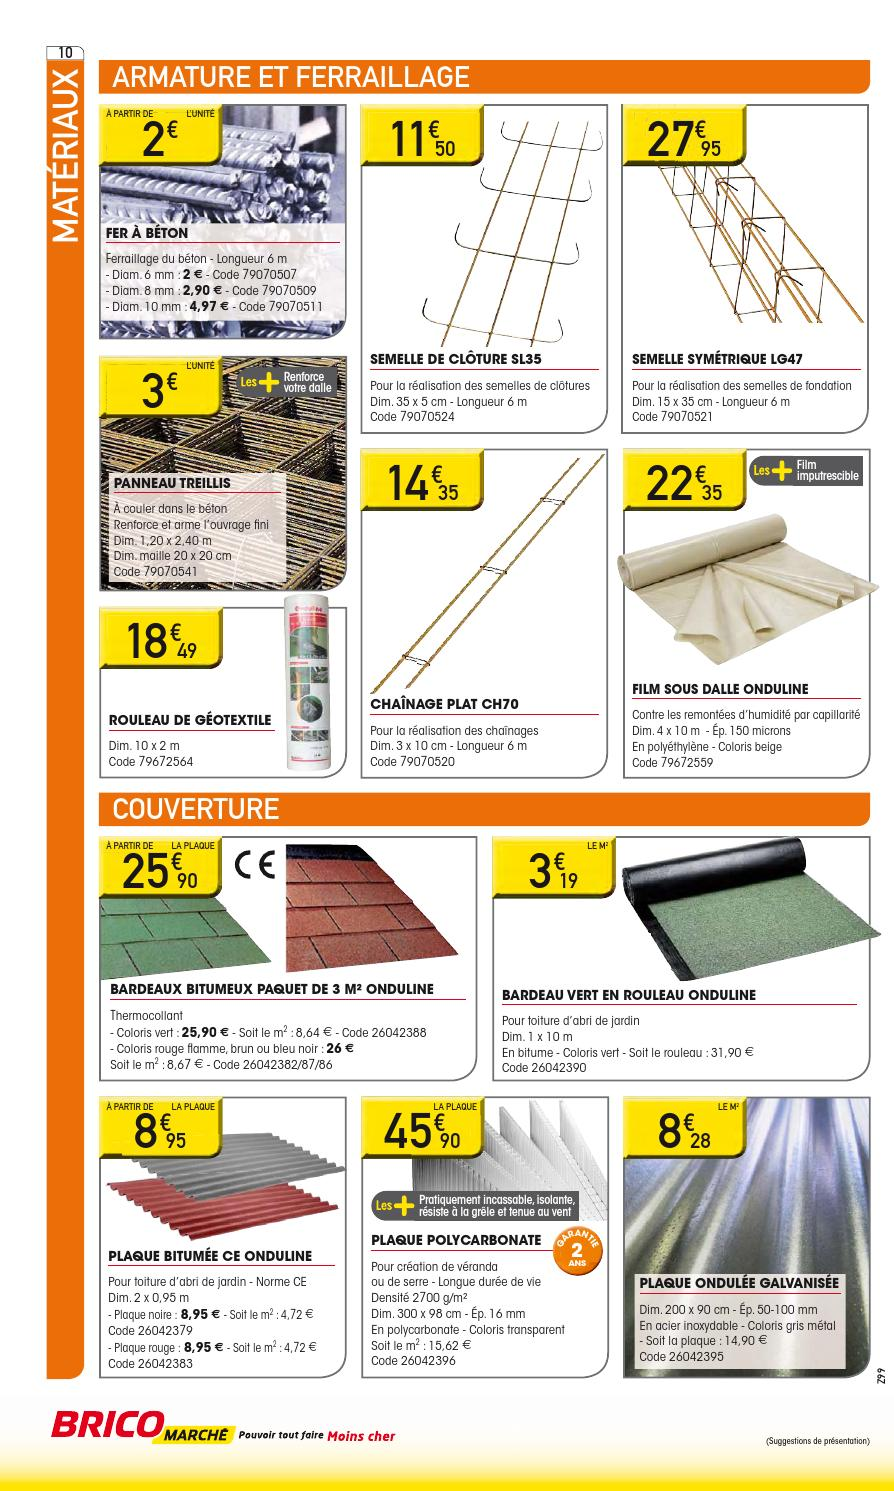 Catalogue Bricomarche Valable Jusqu Au 29 09 2013 By Joe Monroe Issuu